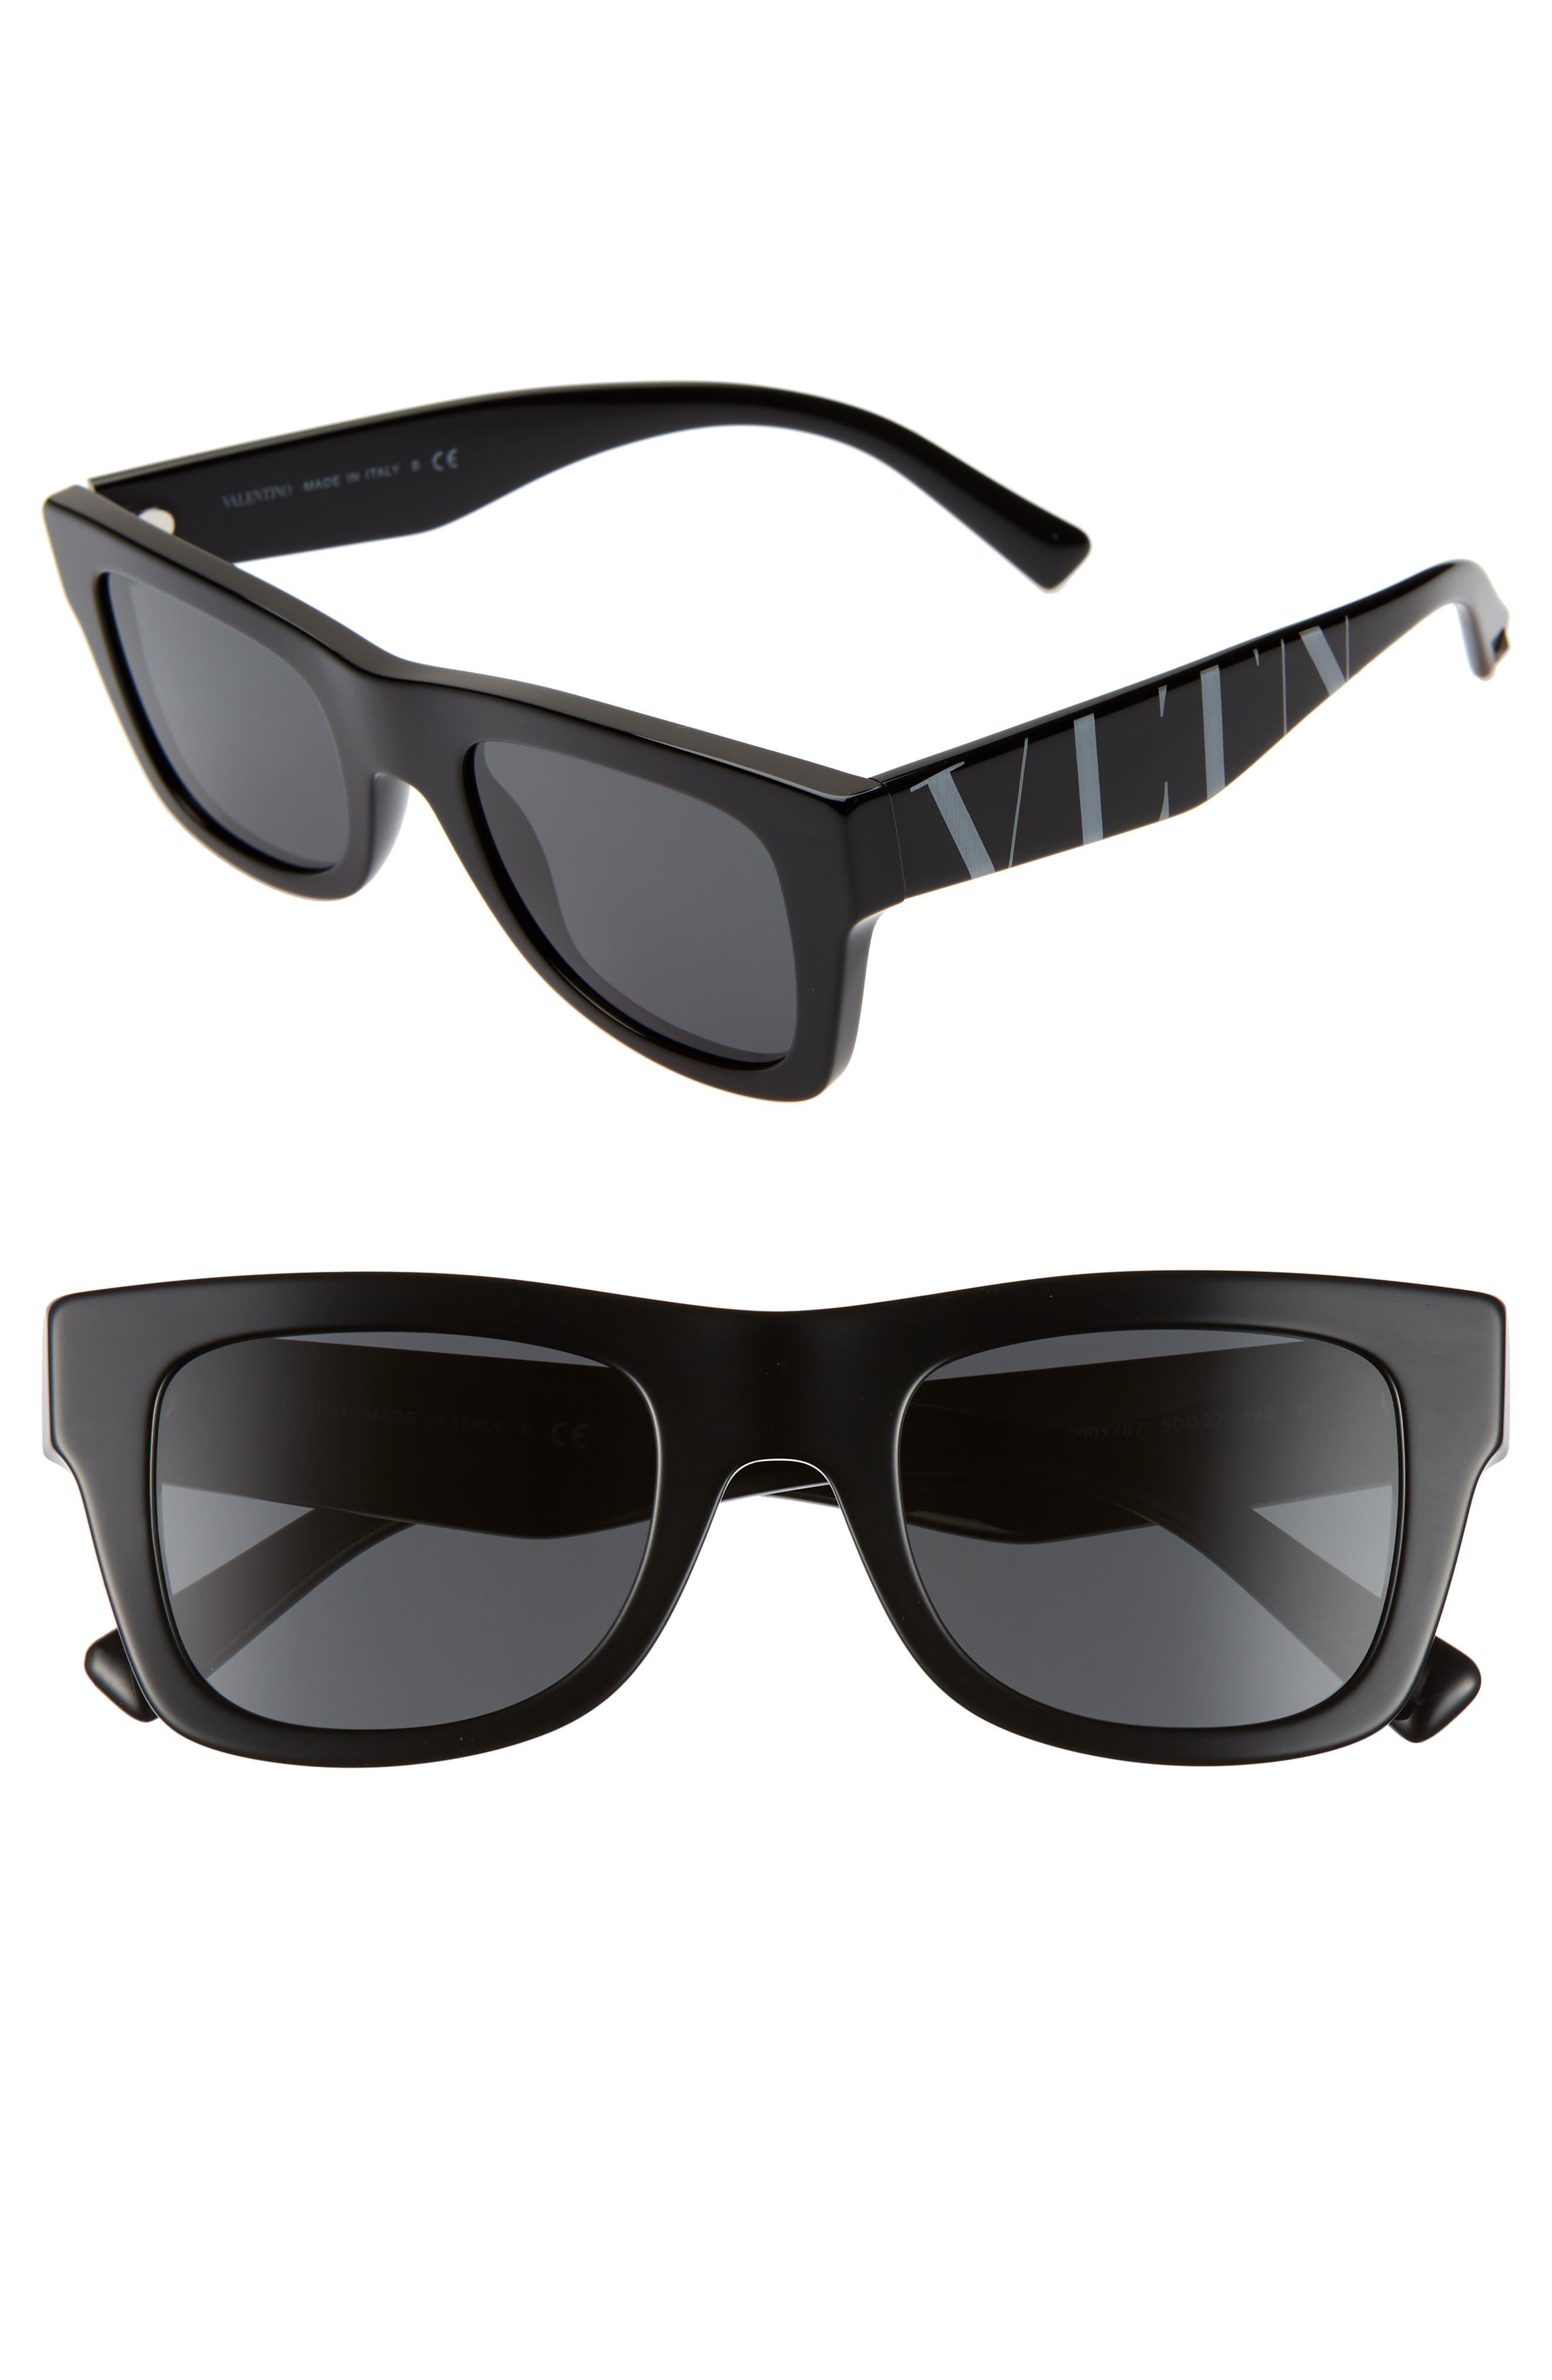 VALENTINO, VLTN 50mm Square Sunglasses, Main thumbnail 1, color, BLACK SOLID